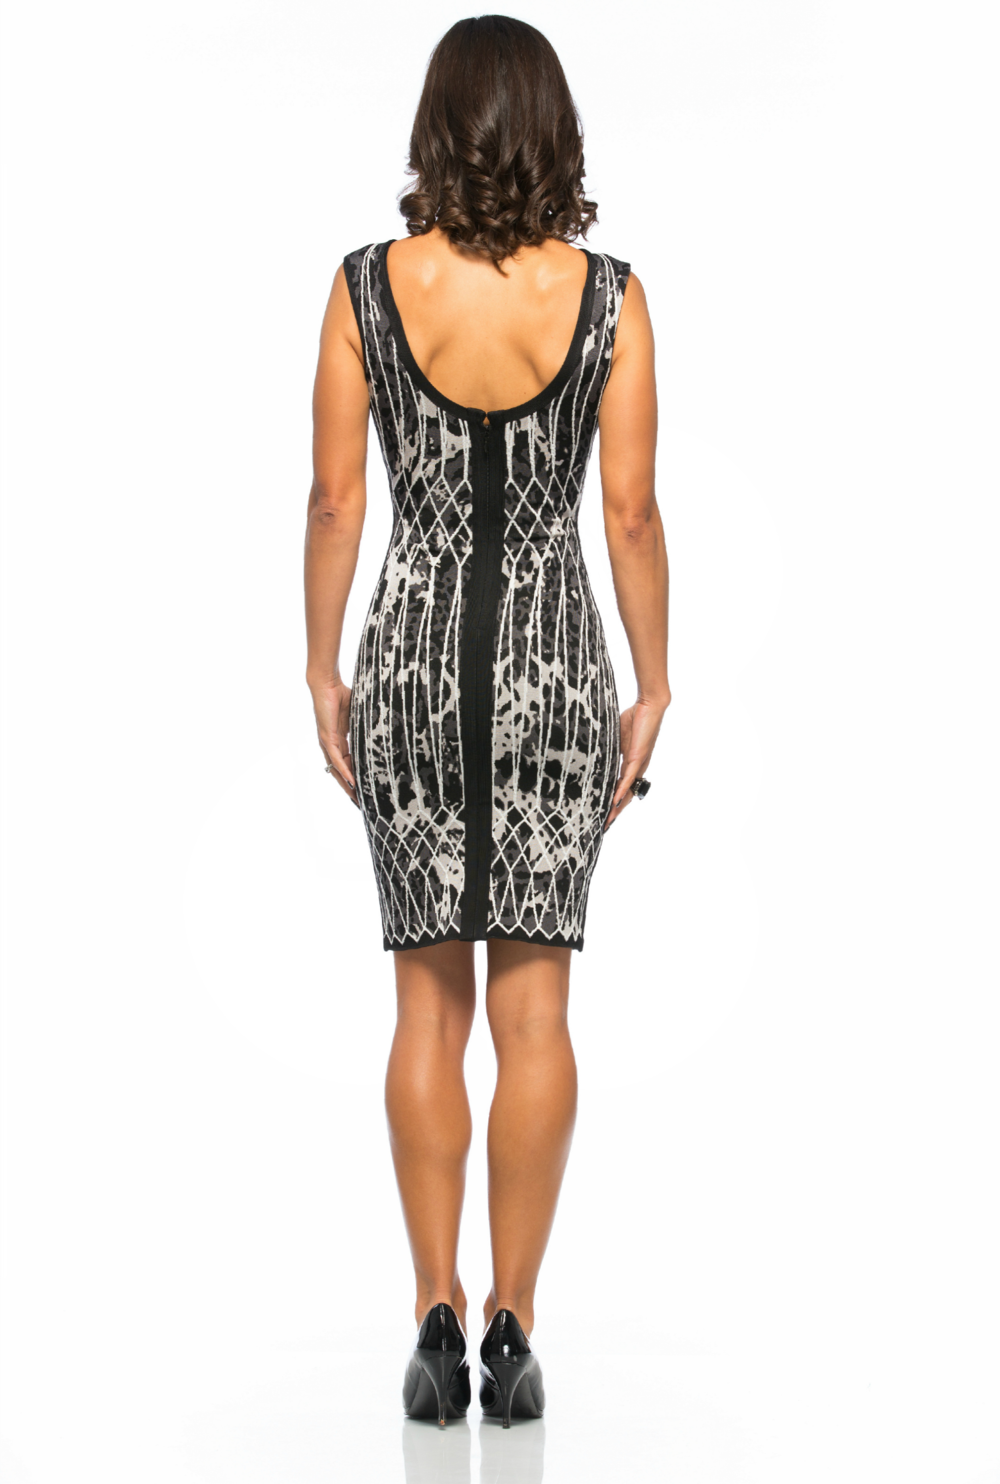 Sidney Open-Back Caged Animal Jacquard Dress $1490